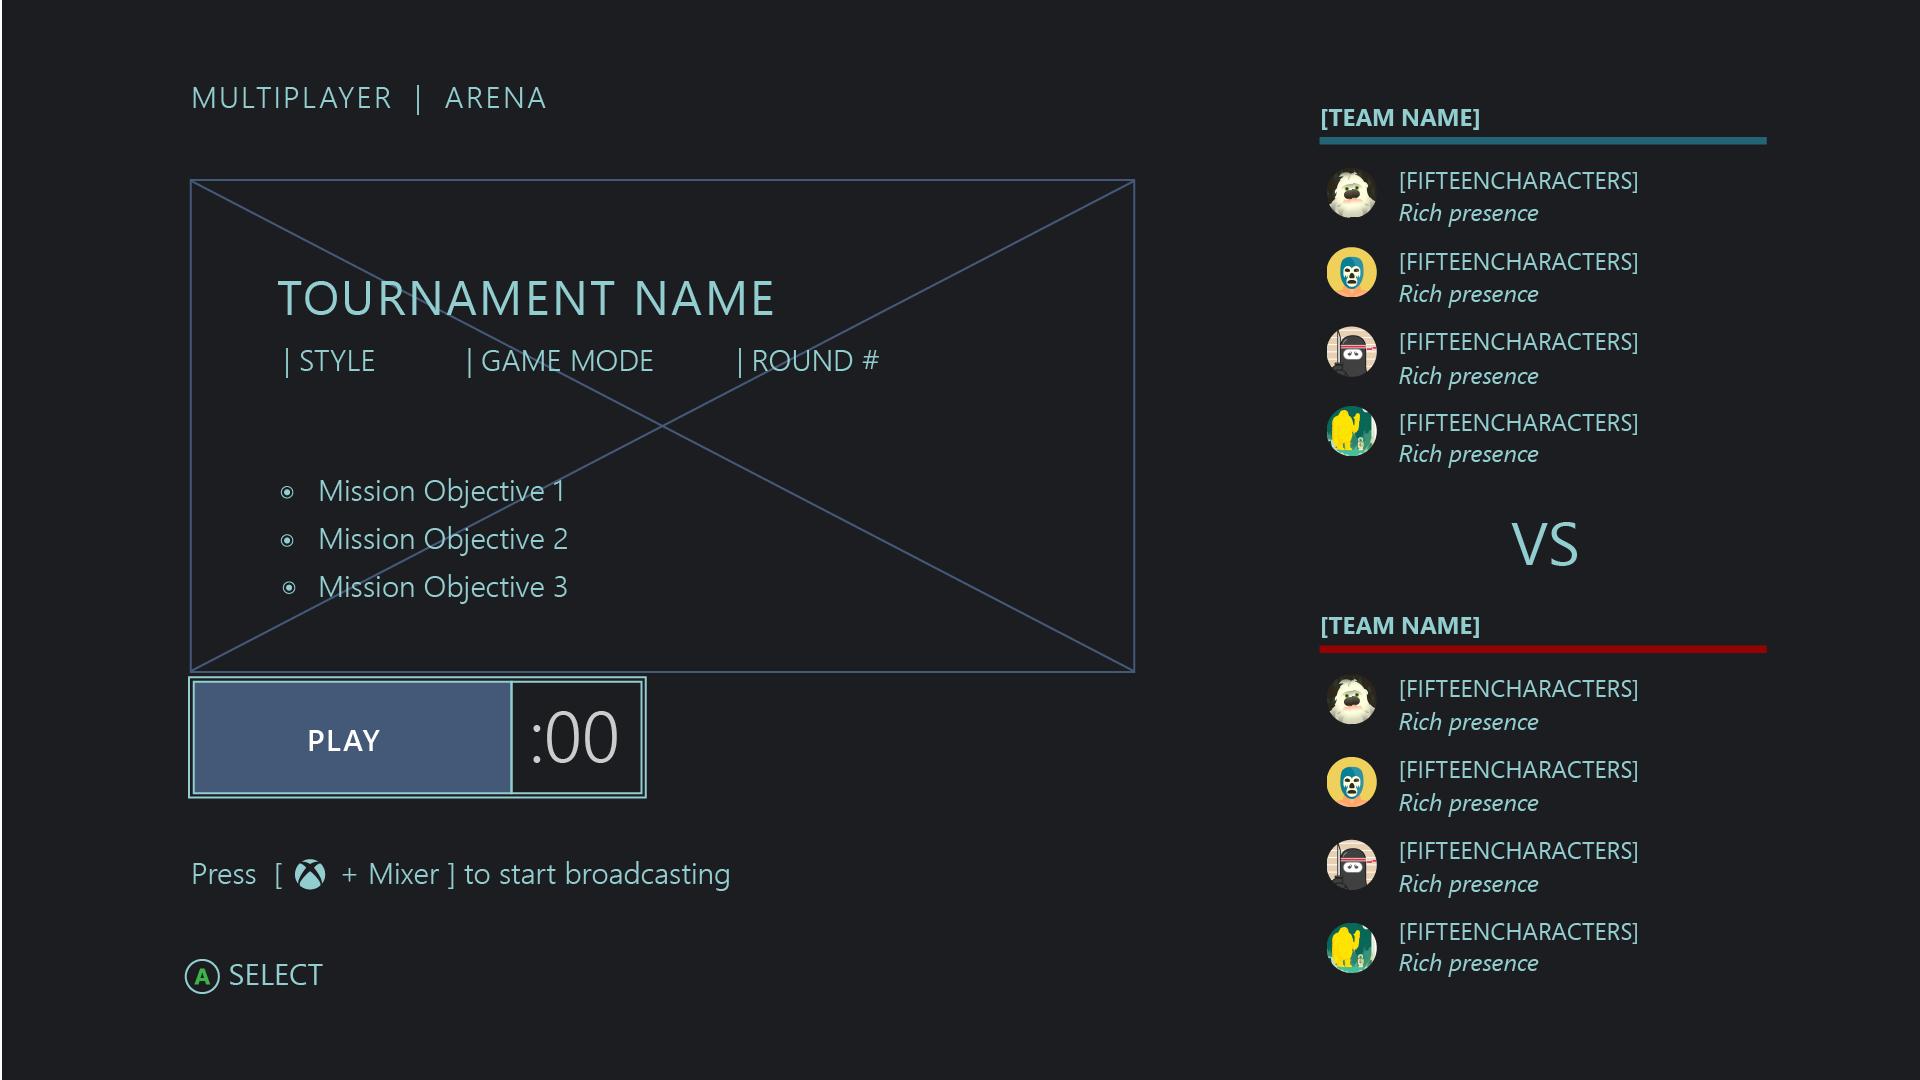 Match engagement - UWP app developer   Microsoft Docs